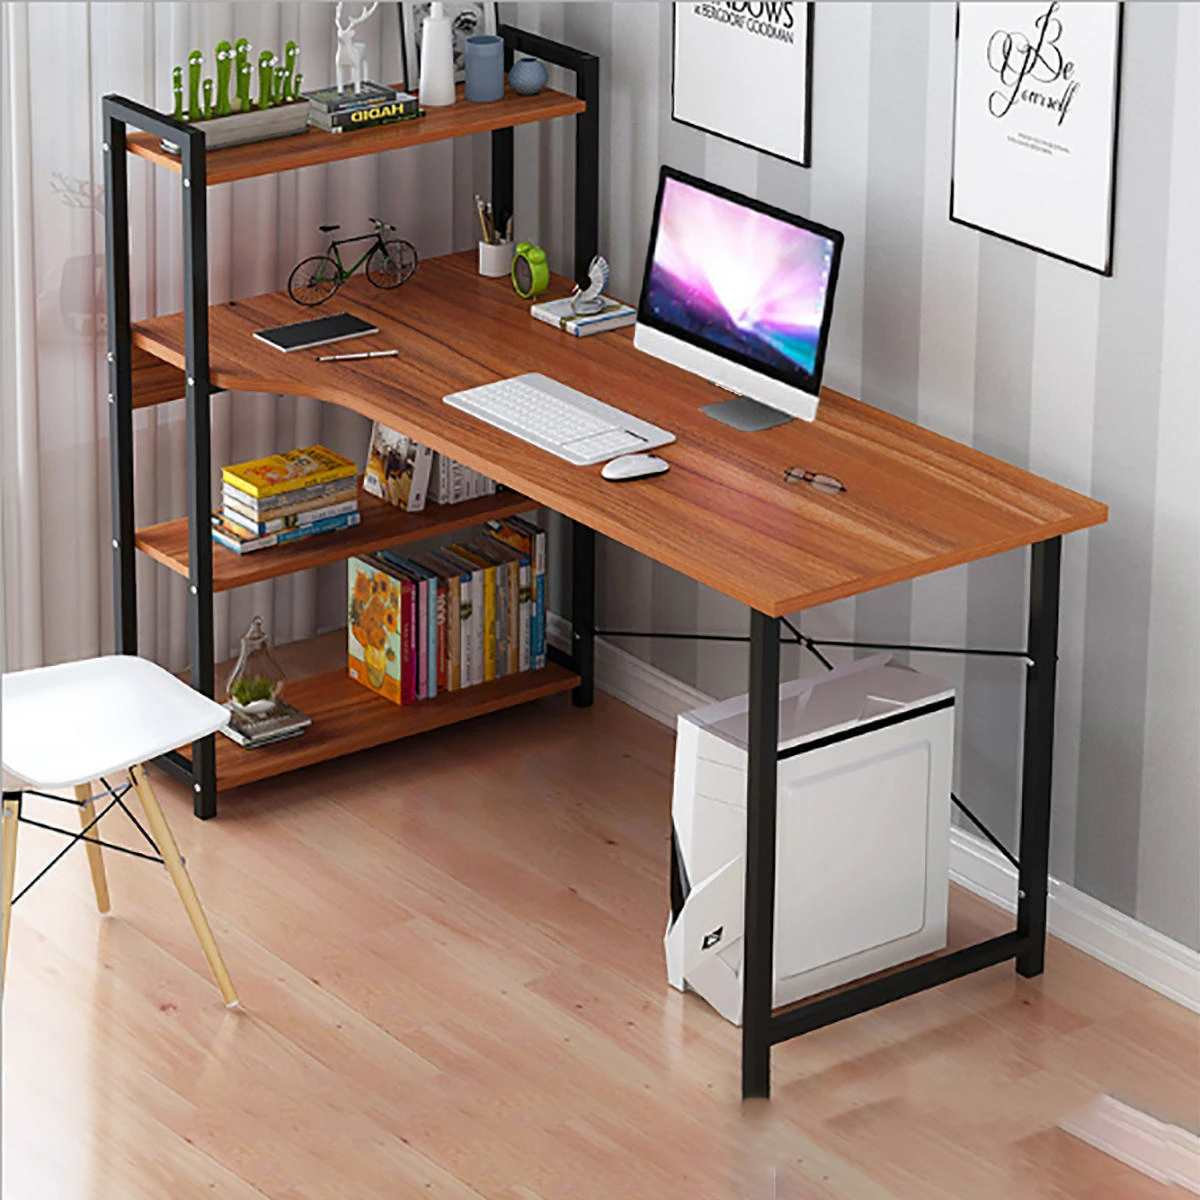 Top SaleDesk Computer-Desk Bookshelf Laptop Studying Upgraded Office Living-Room Modern-Style